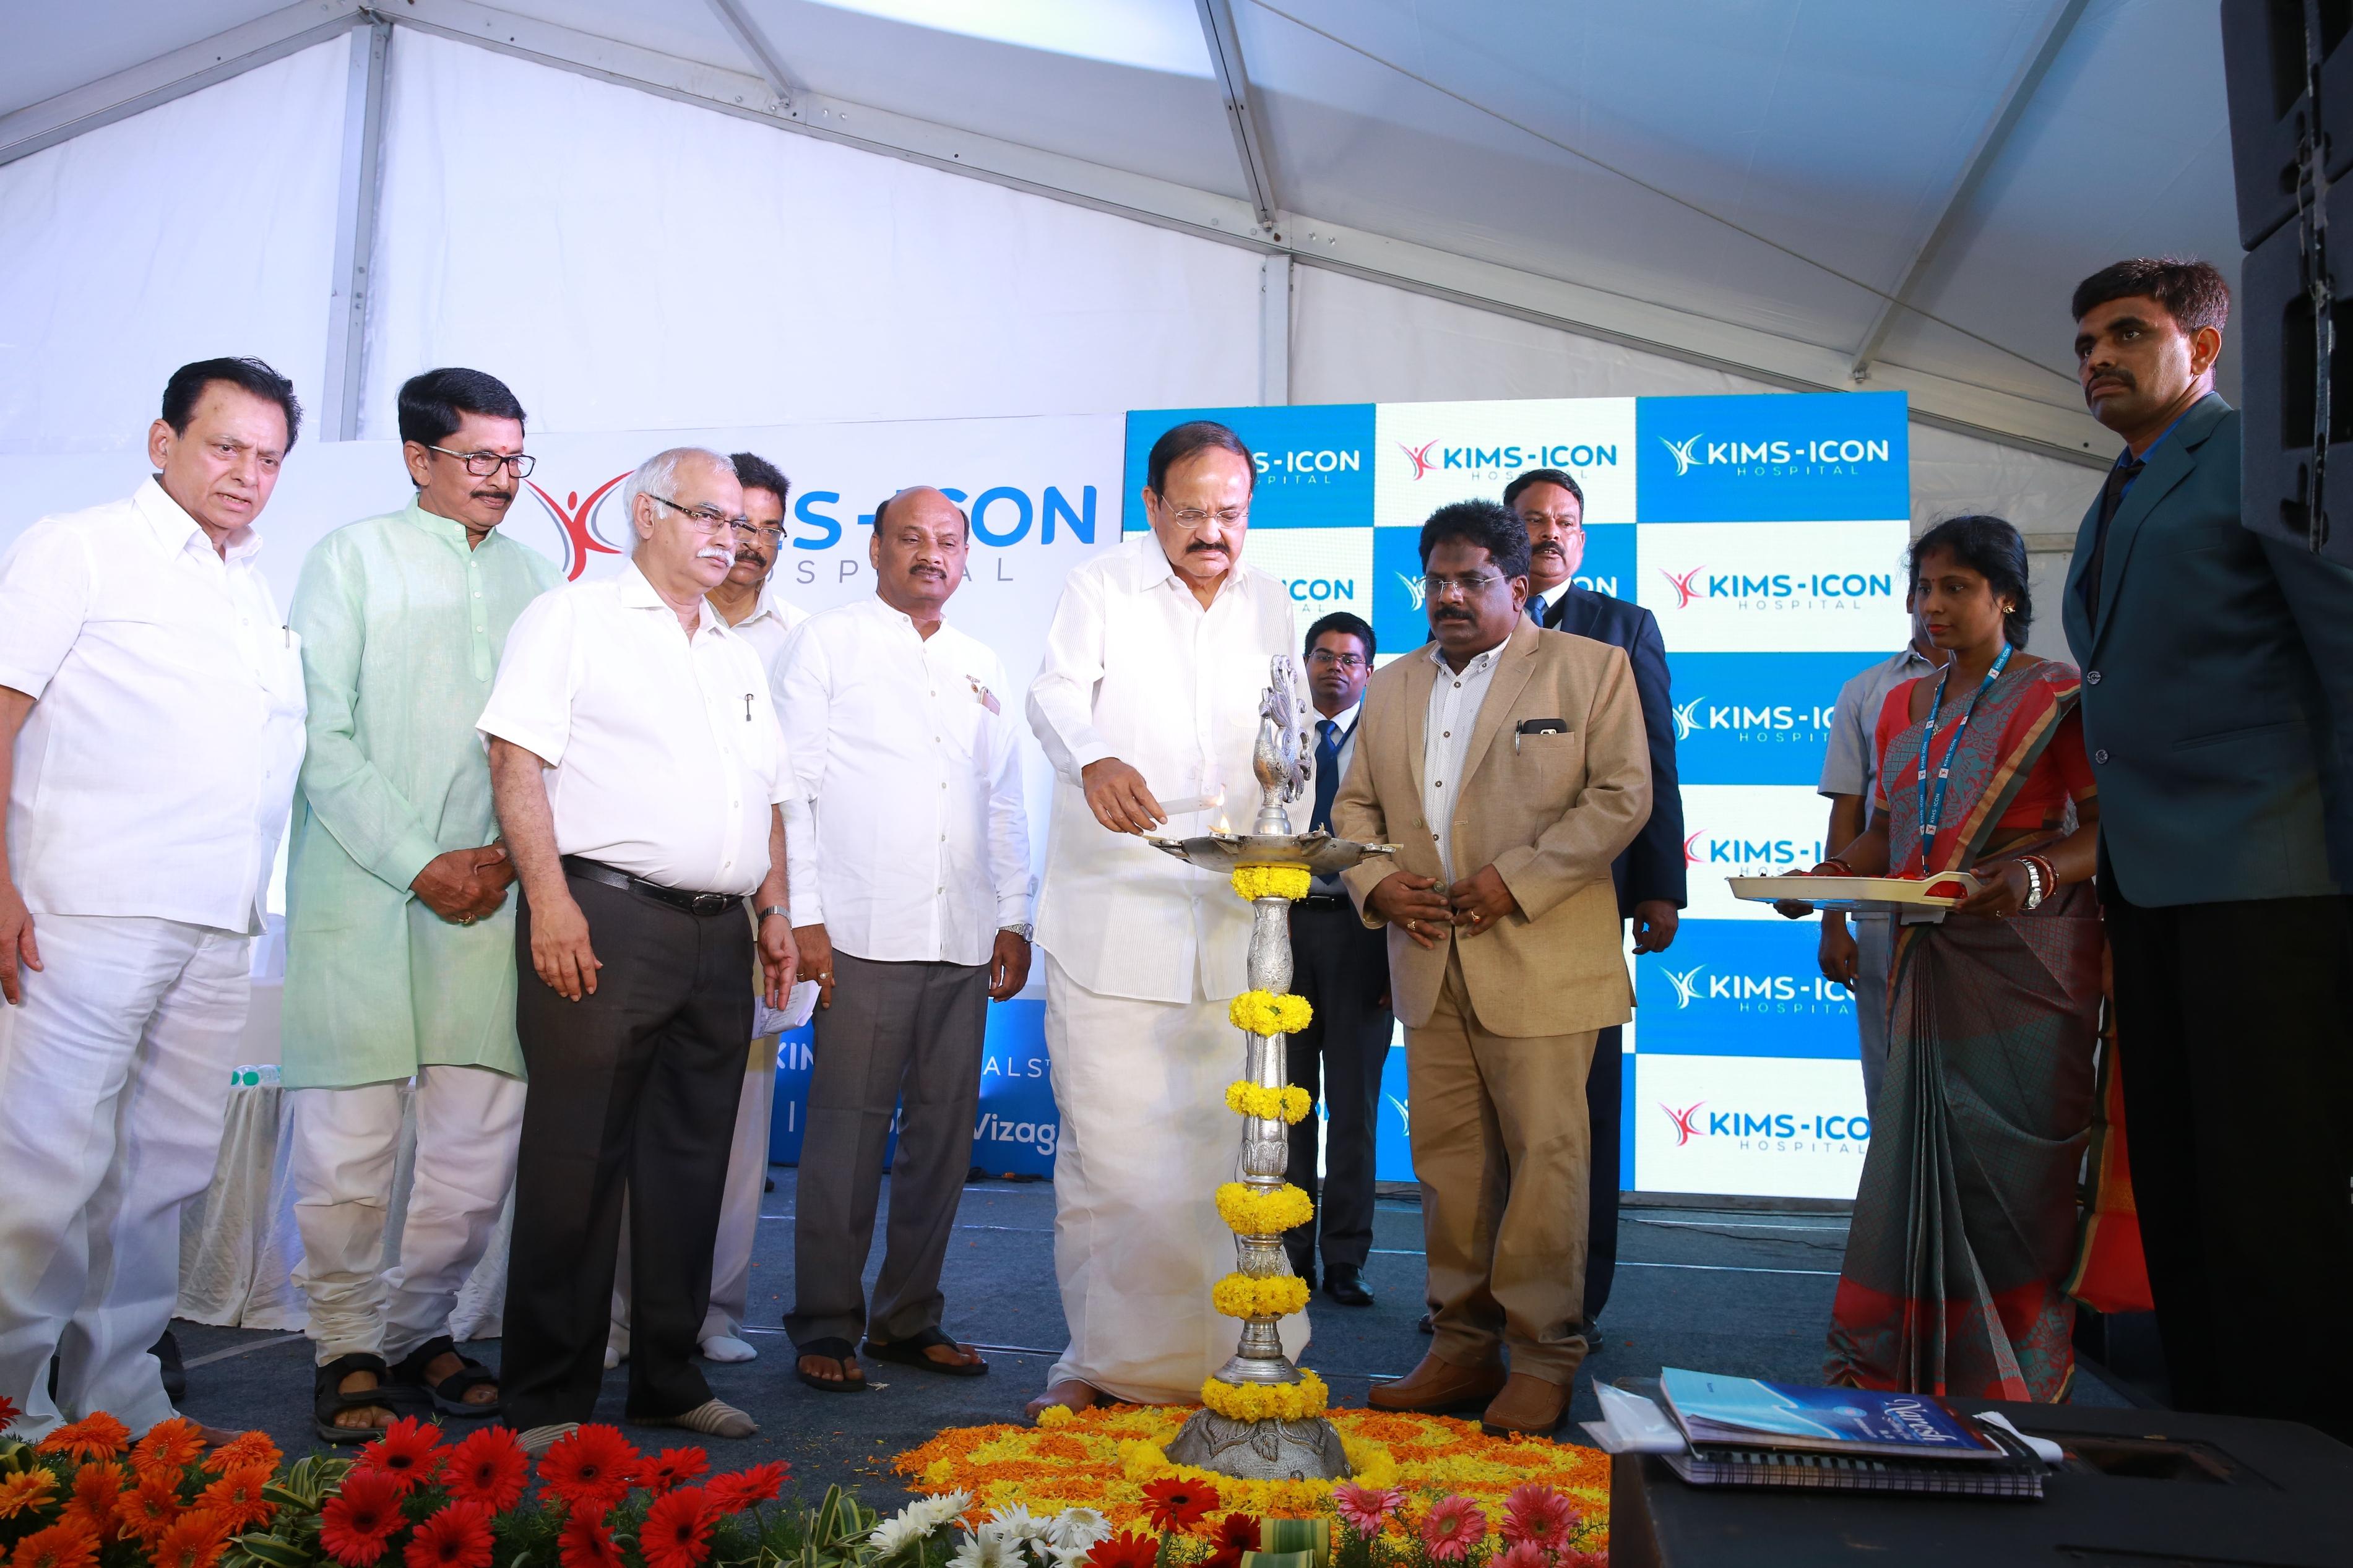 Vice President Venkaiah Naidu Inaugurates 434 bedded KIMS ICON Hospital at Vizag